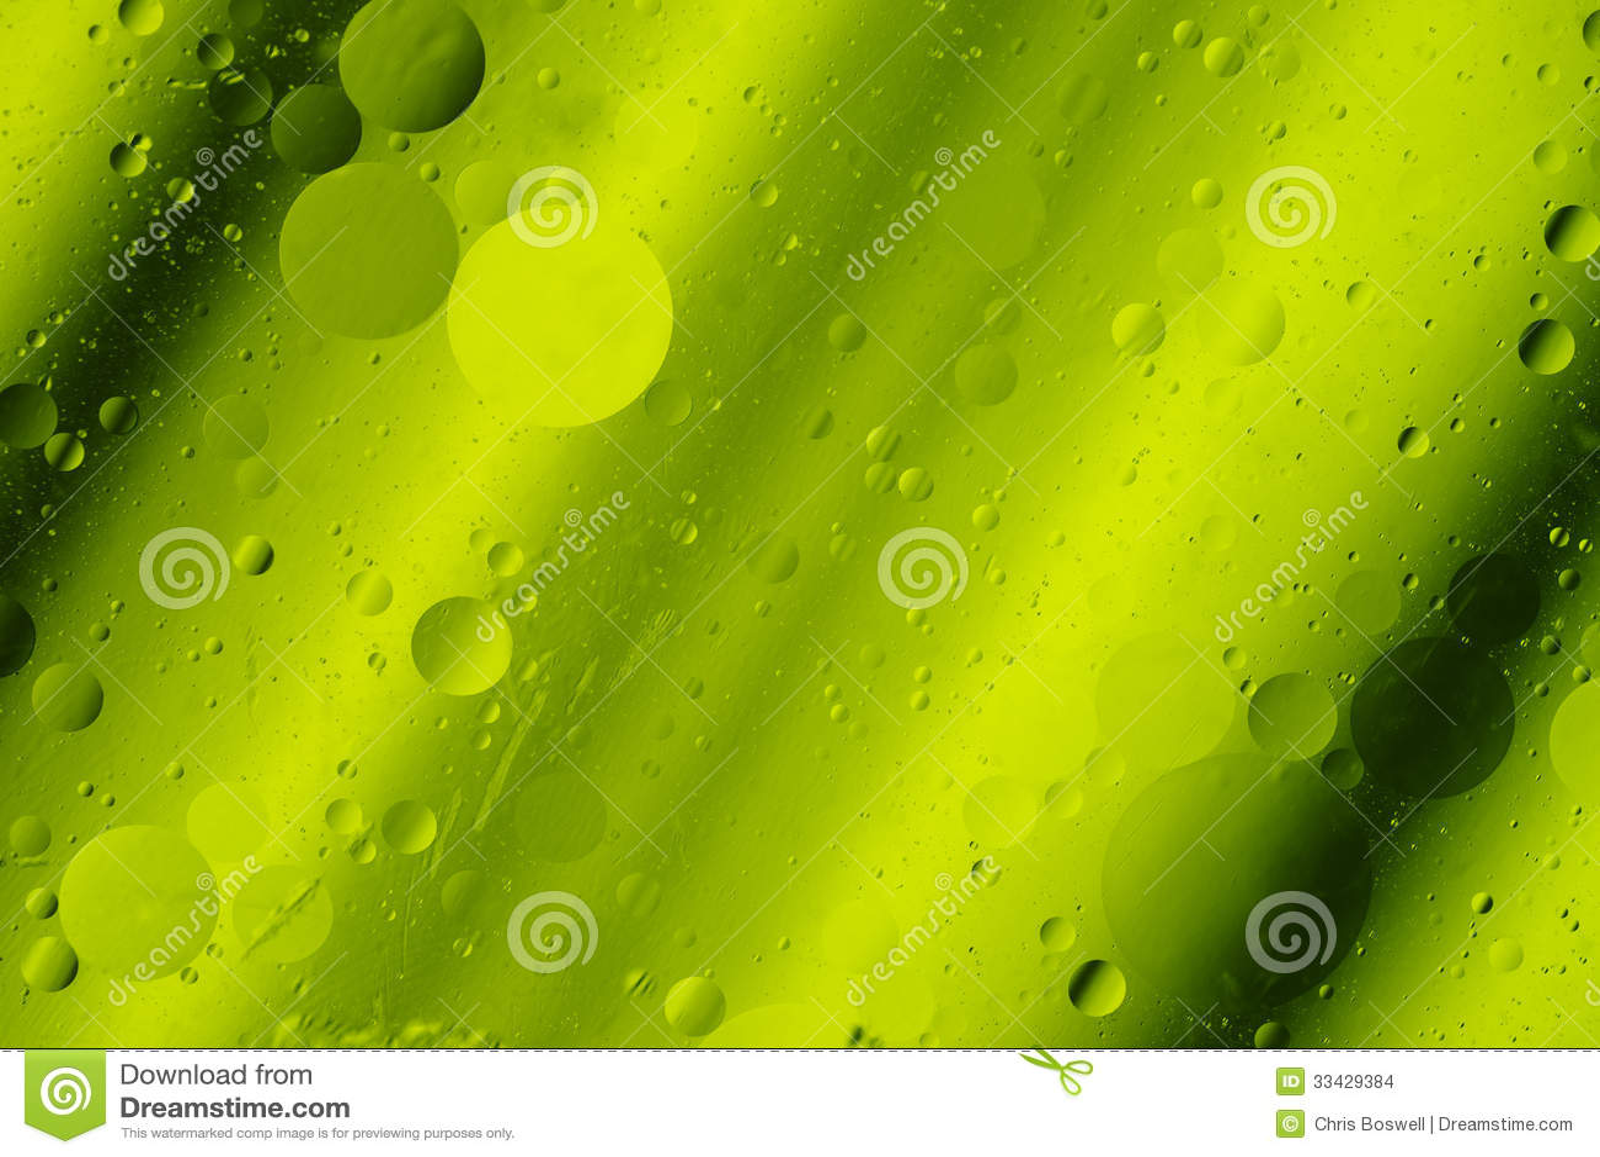 limegreen design